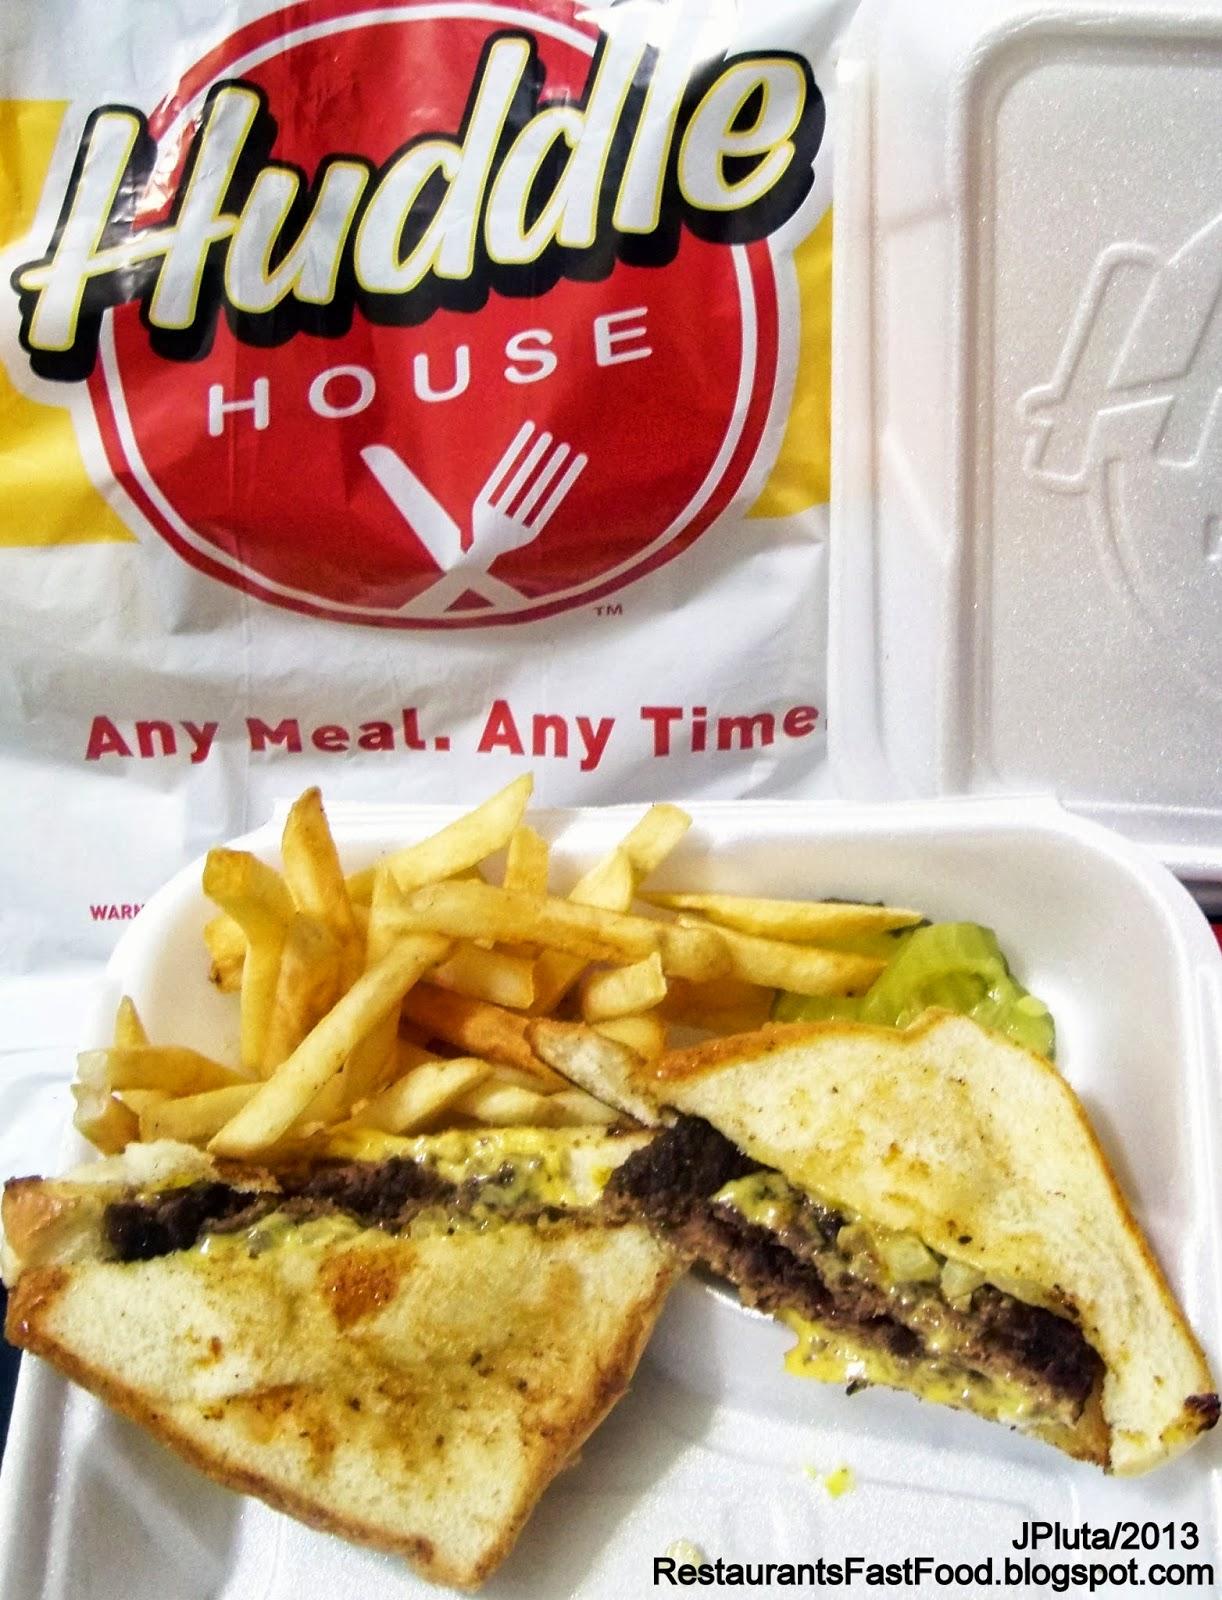 Fast Food Restaurants In Hazard Ky